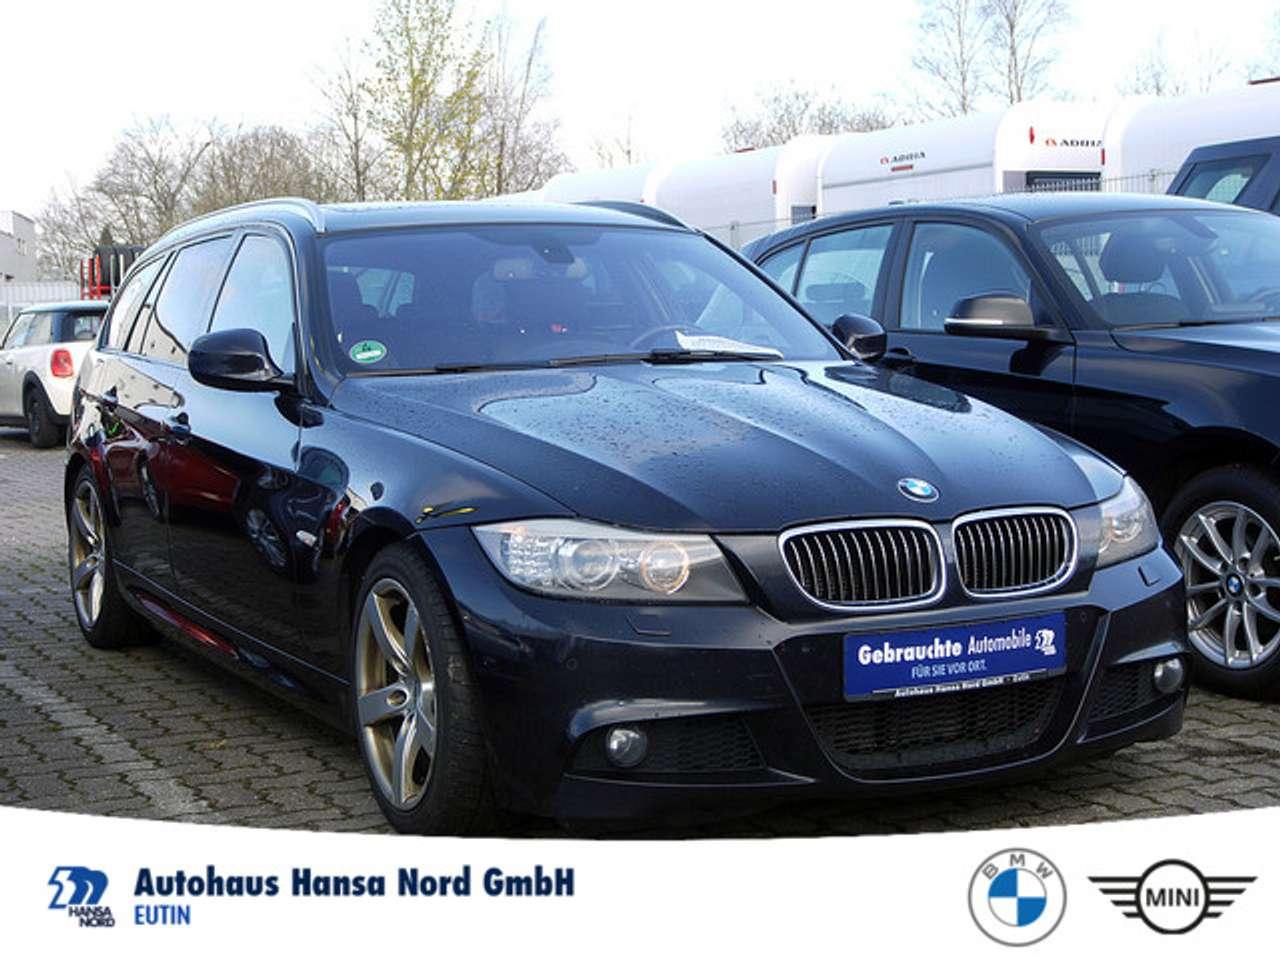 Autos nach BMW D10 Biturbo touring